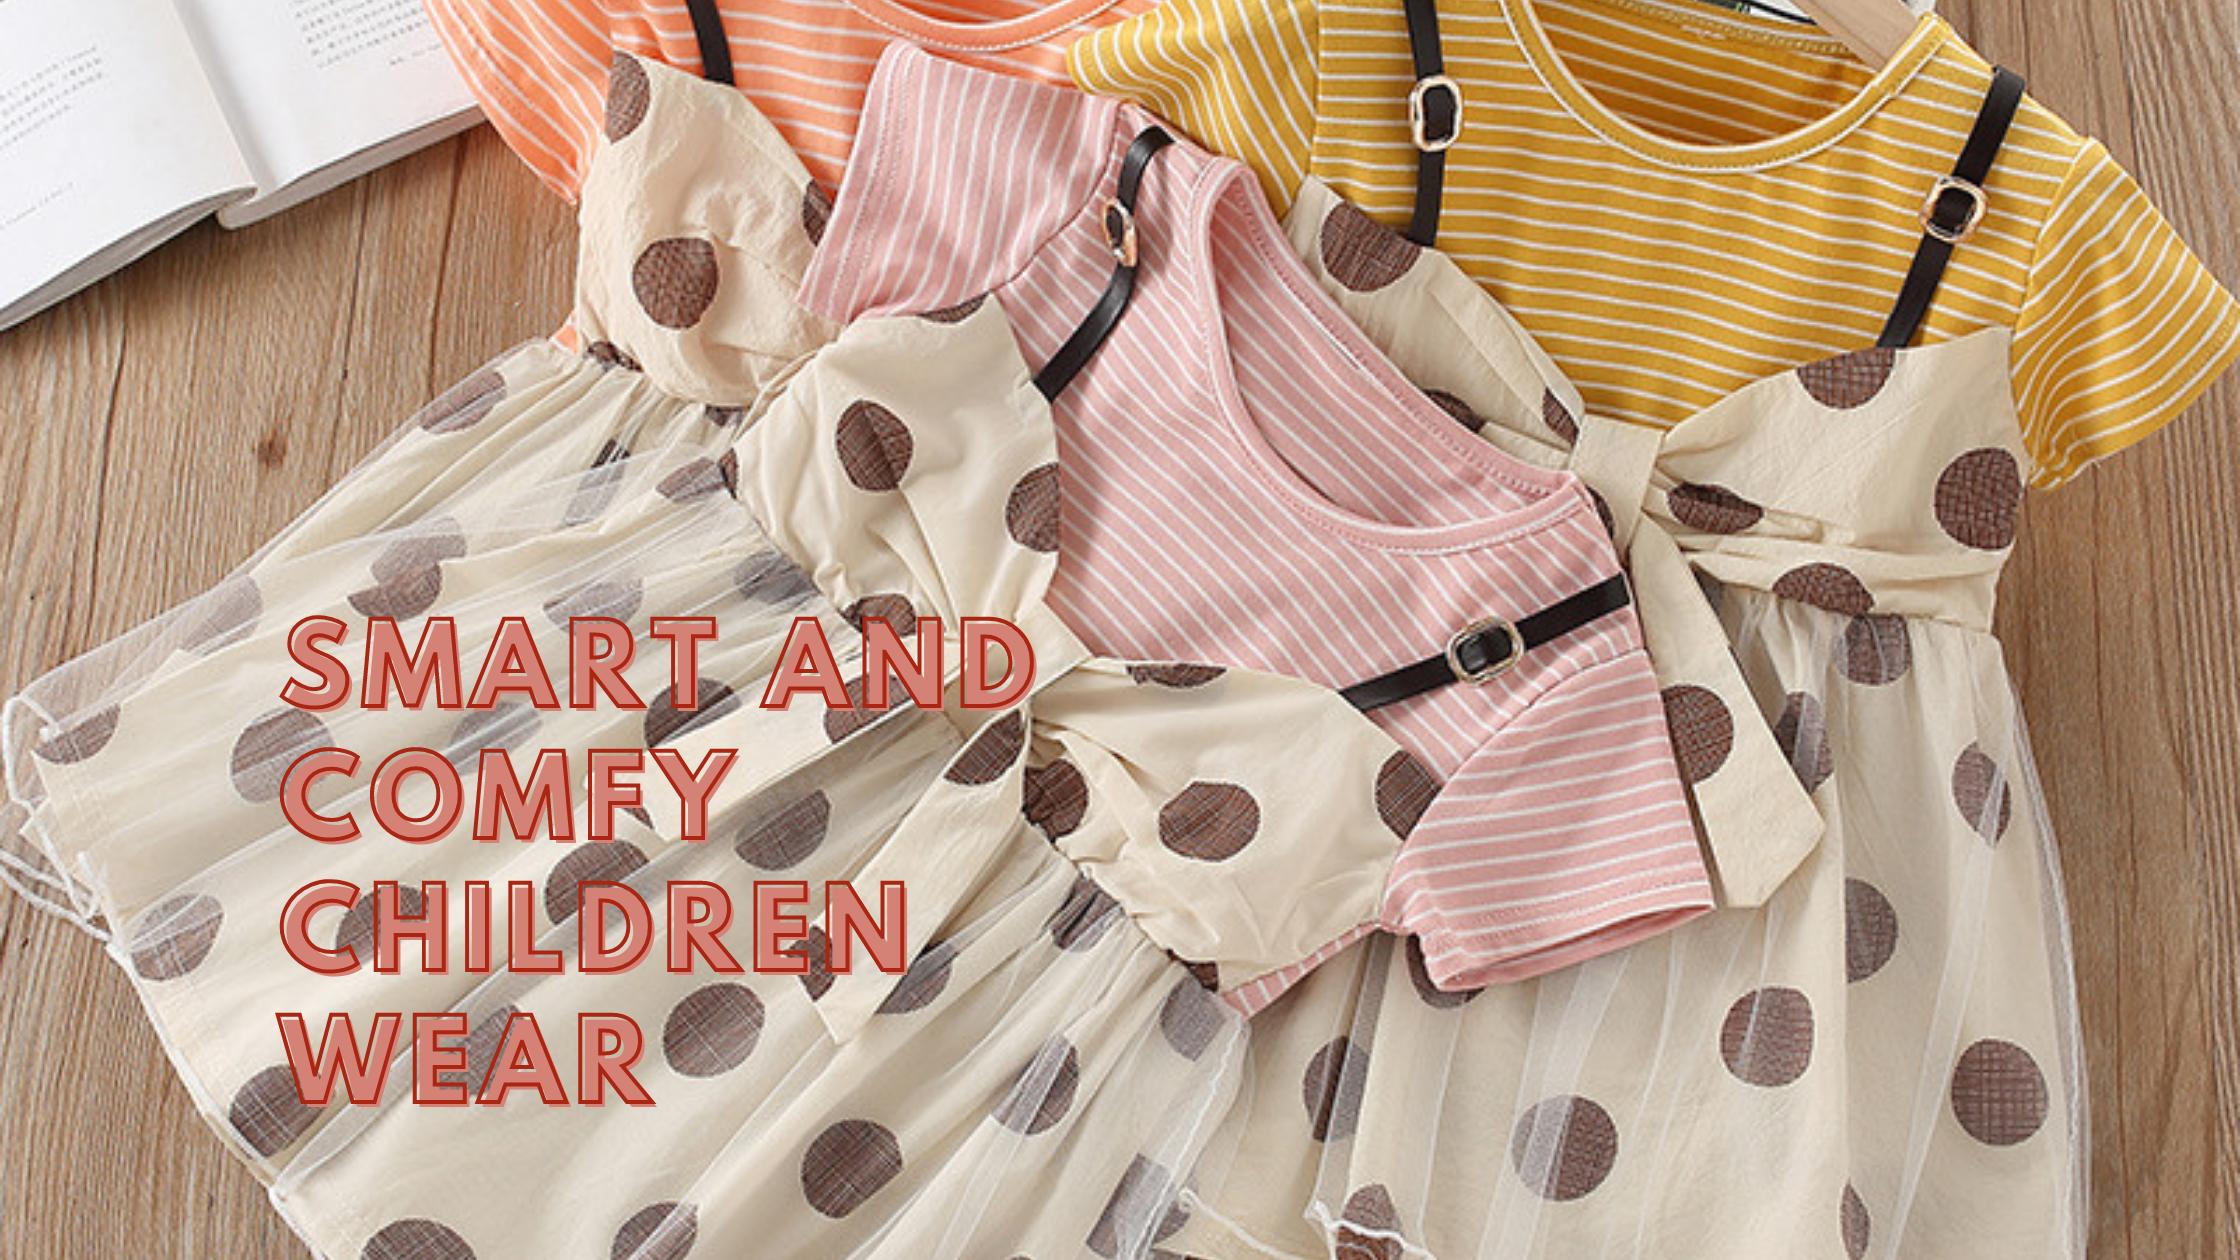 Smart and Comfy Children Wear